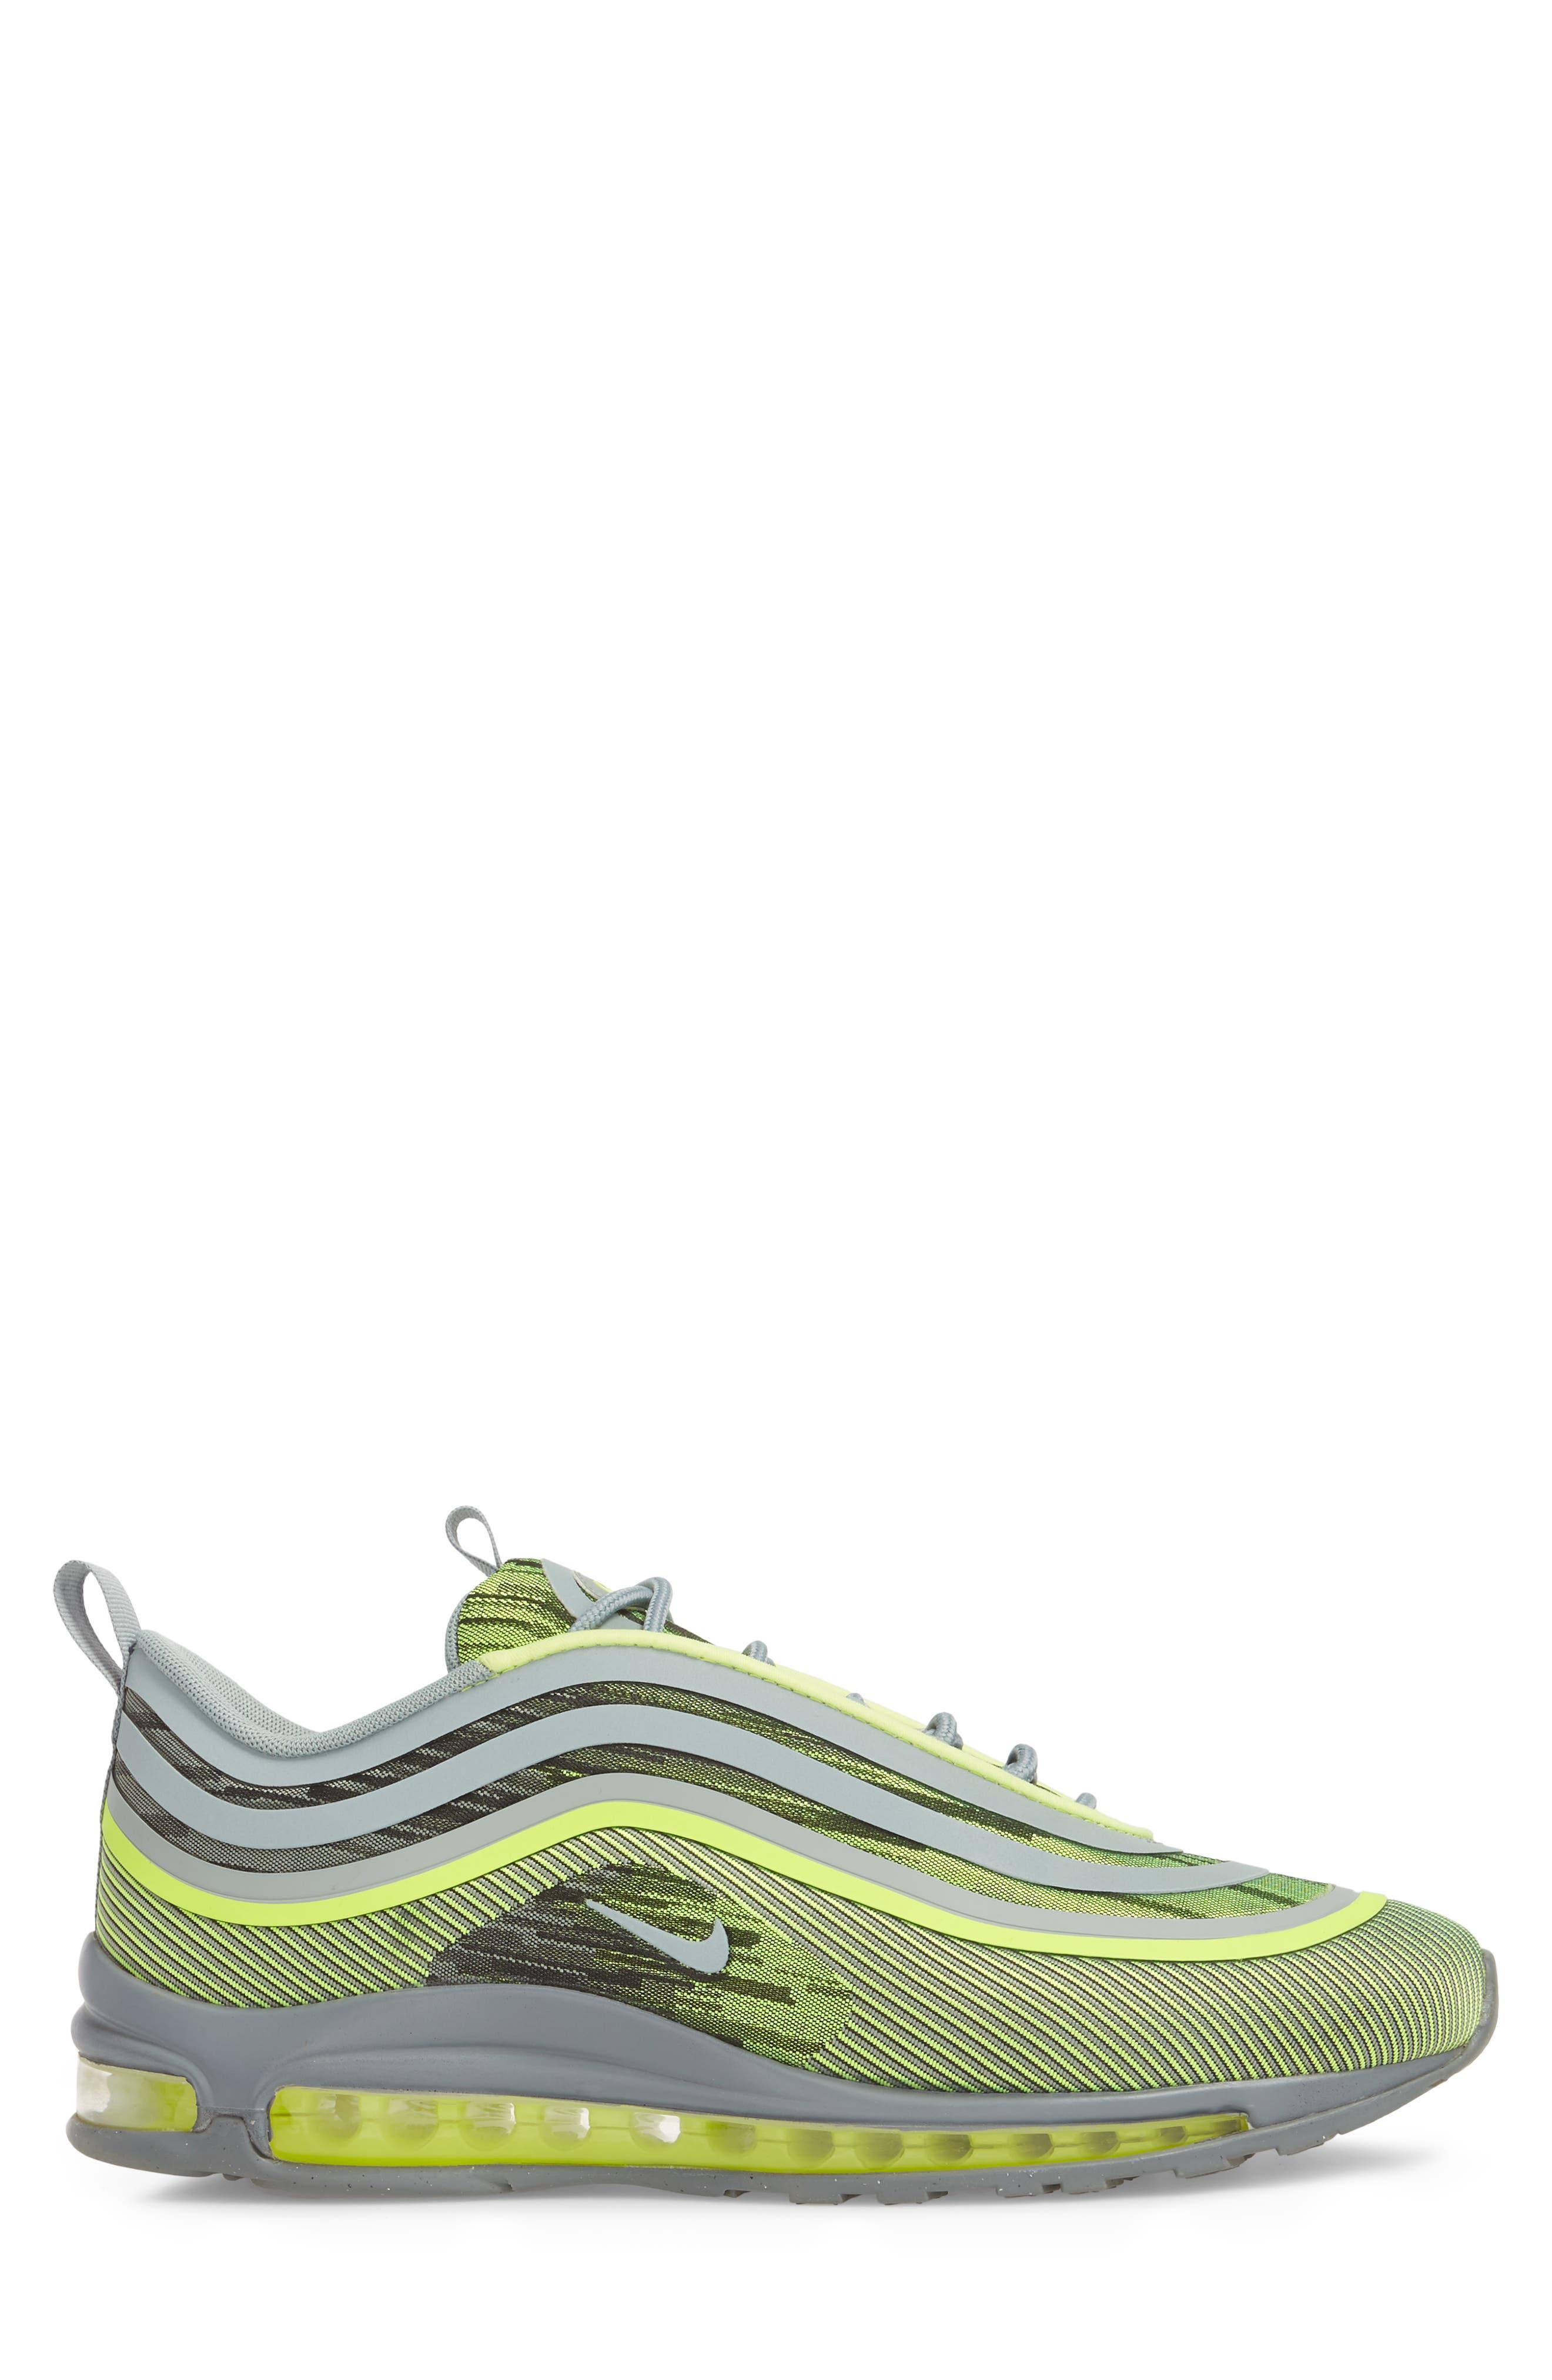 Air Max 97 Ultra '17 Sneaker,                             Alternate thumbnail 3, color,                             Volt/ Mica Green/ Cool Grey